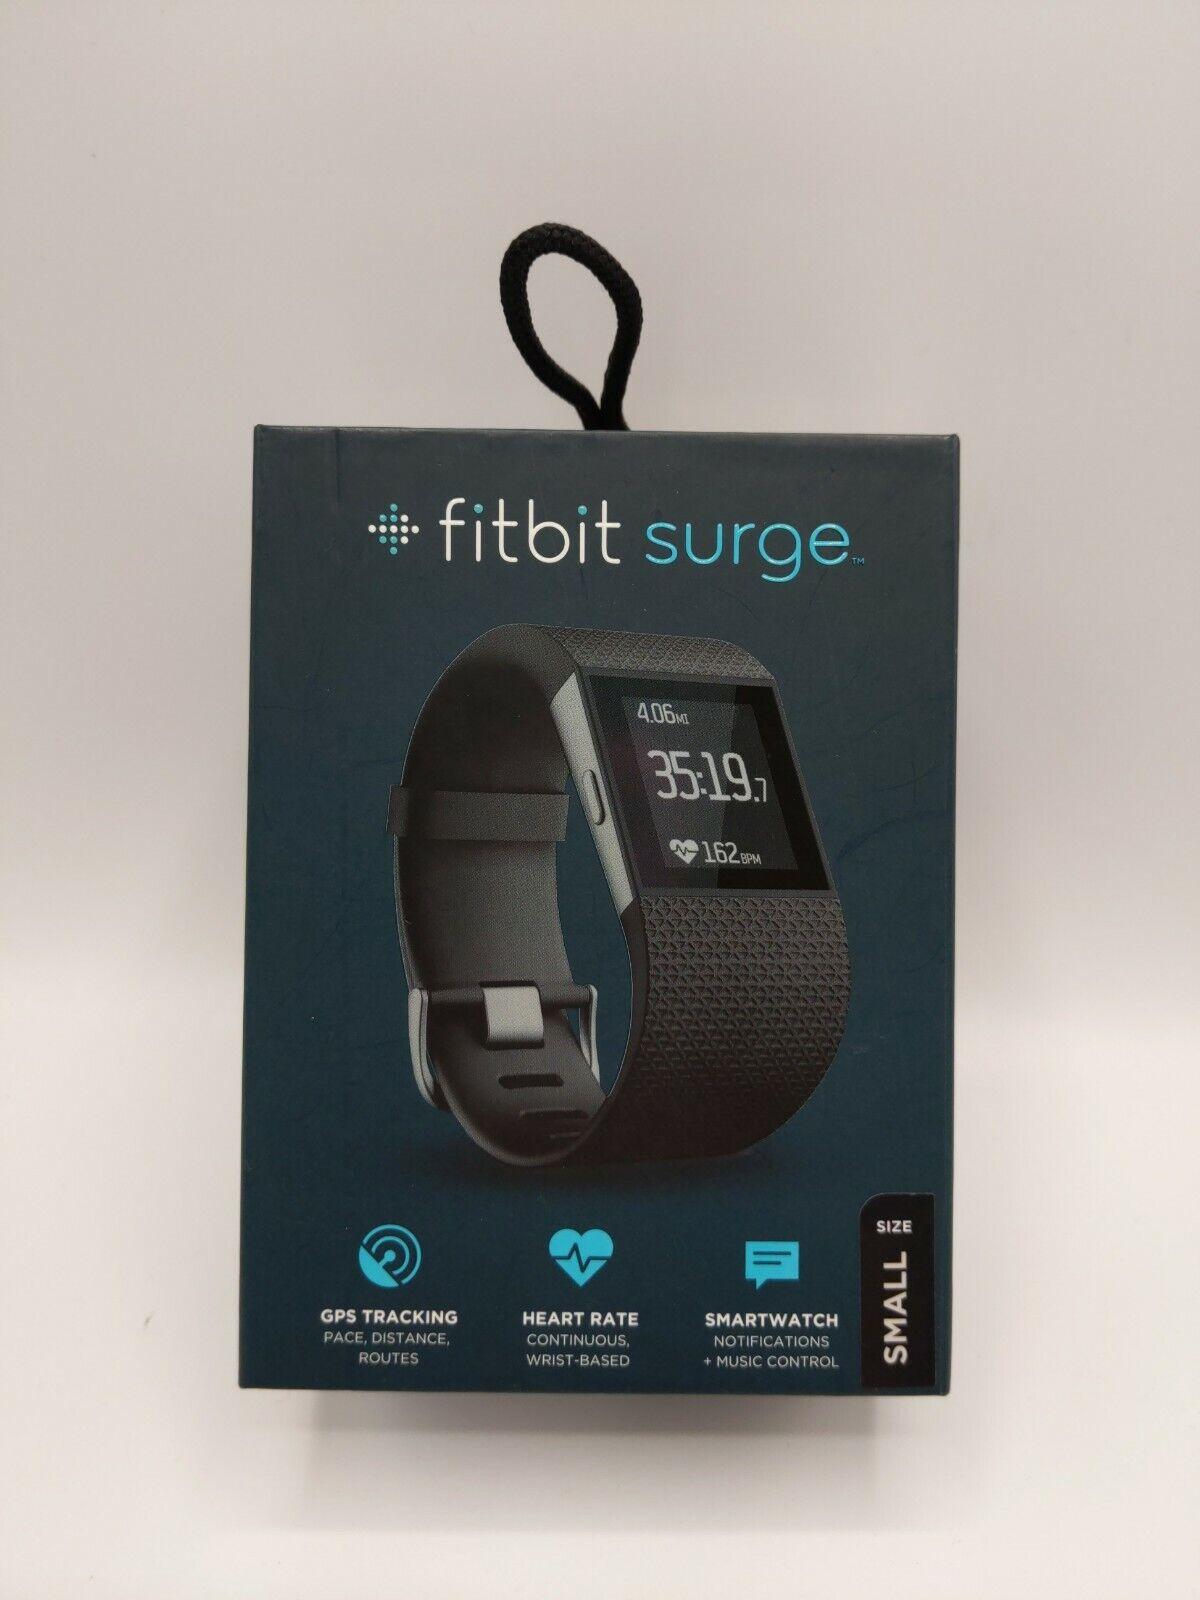 Fitbit Surge GPS Heart Rate Sleep Smartwatch Fitness Tracker - SMALL fitbit fitness gps heart rate sleep small smartwatch surge tracker